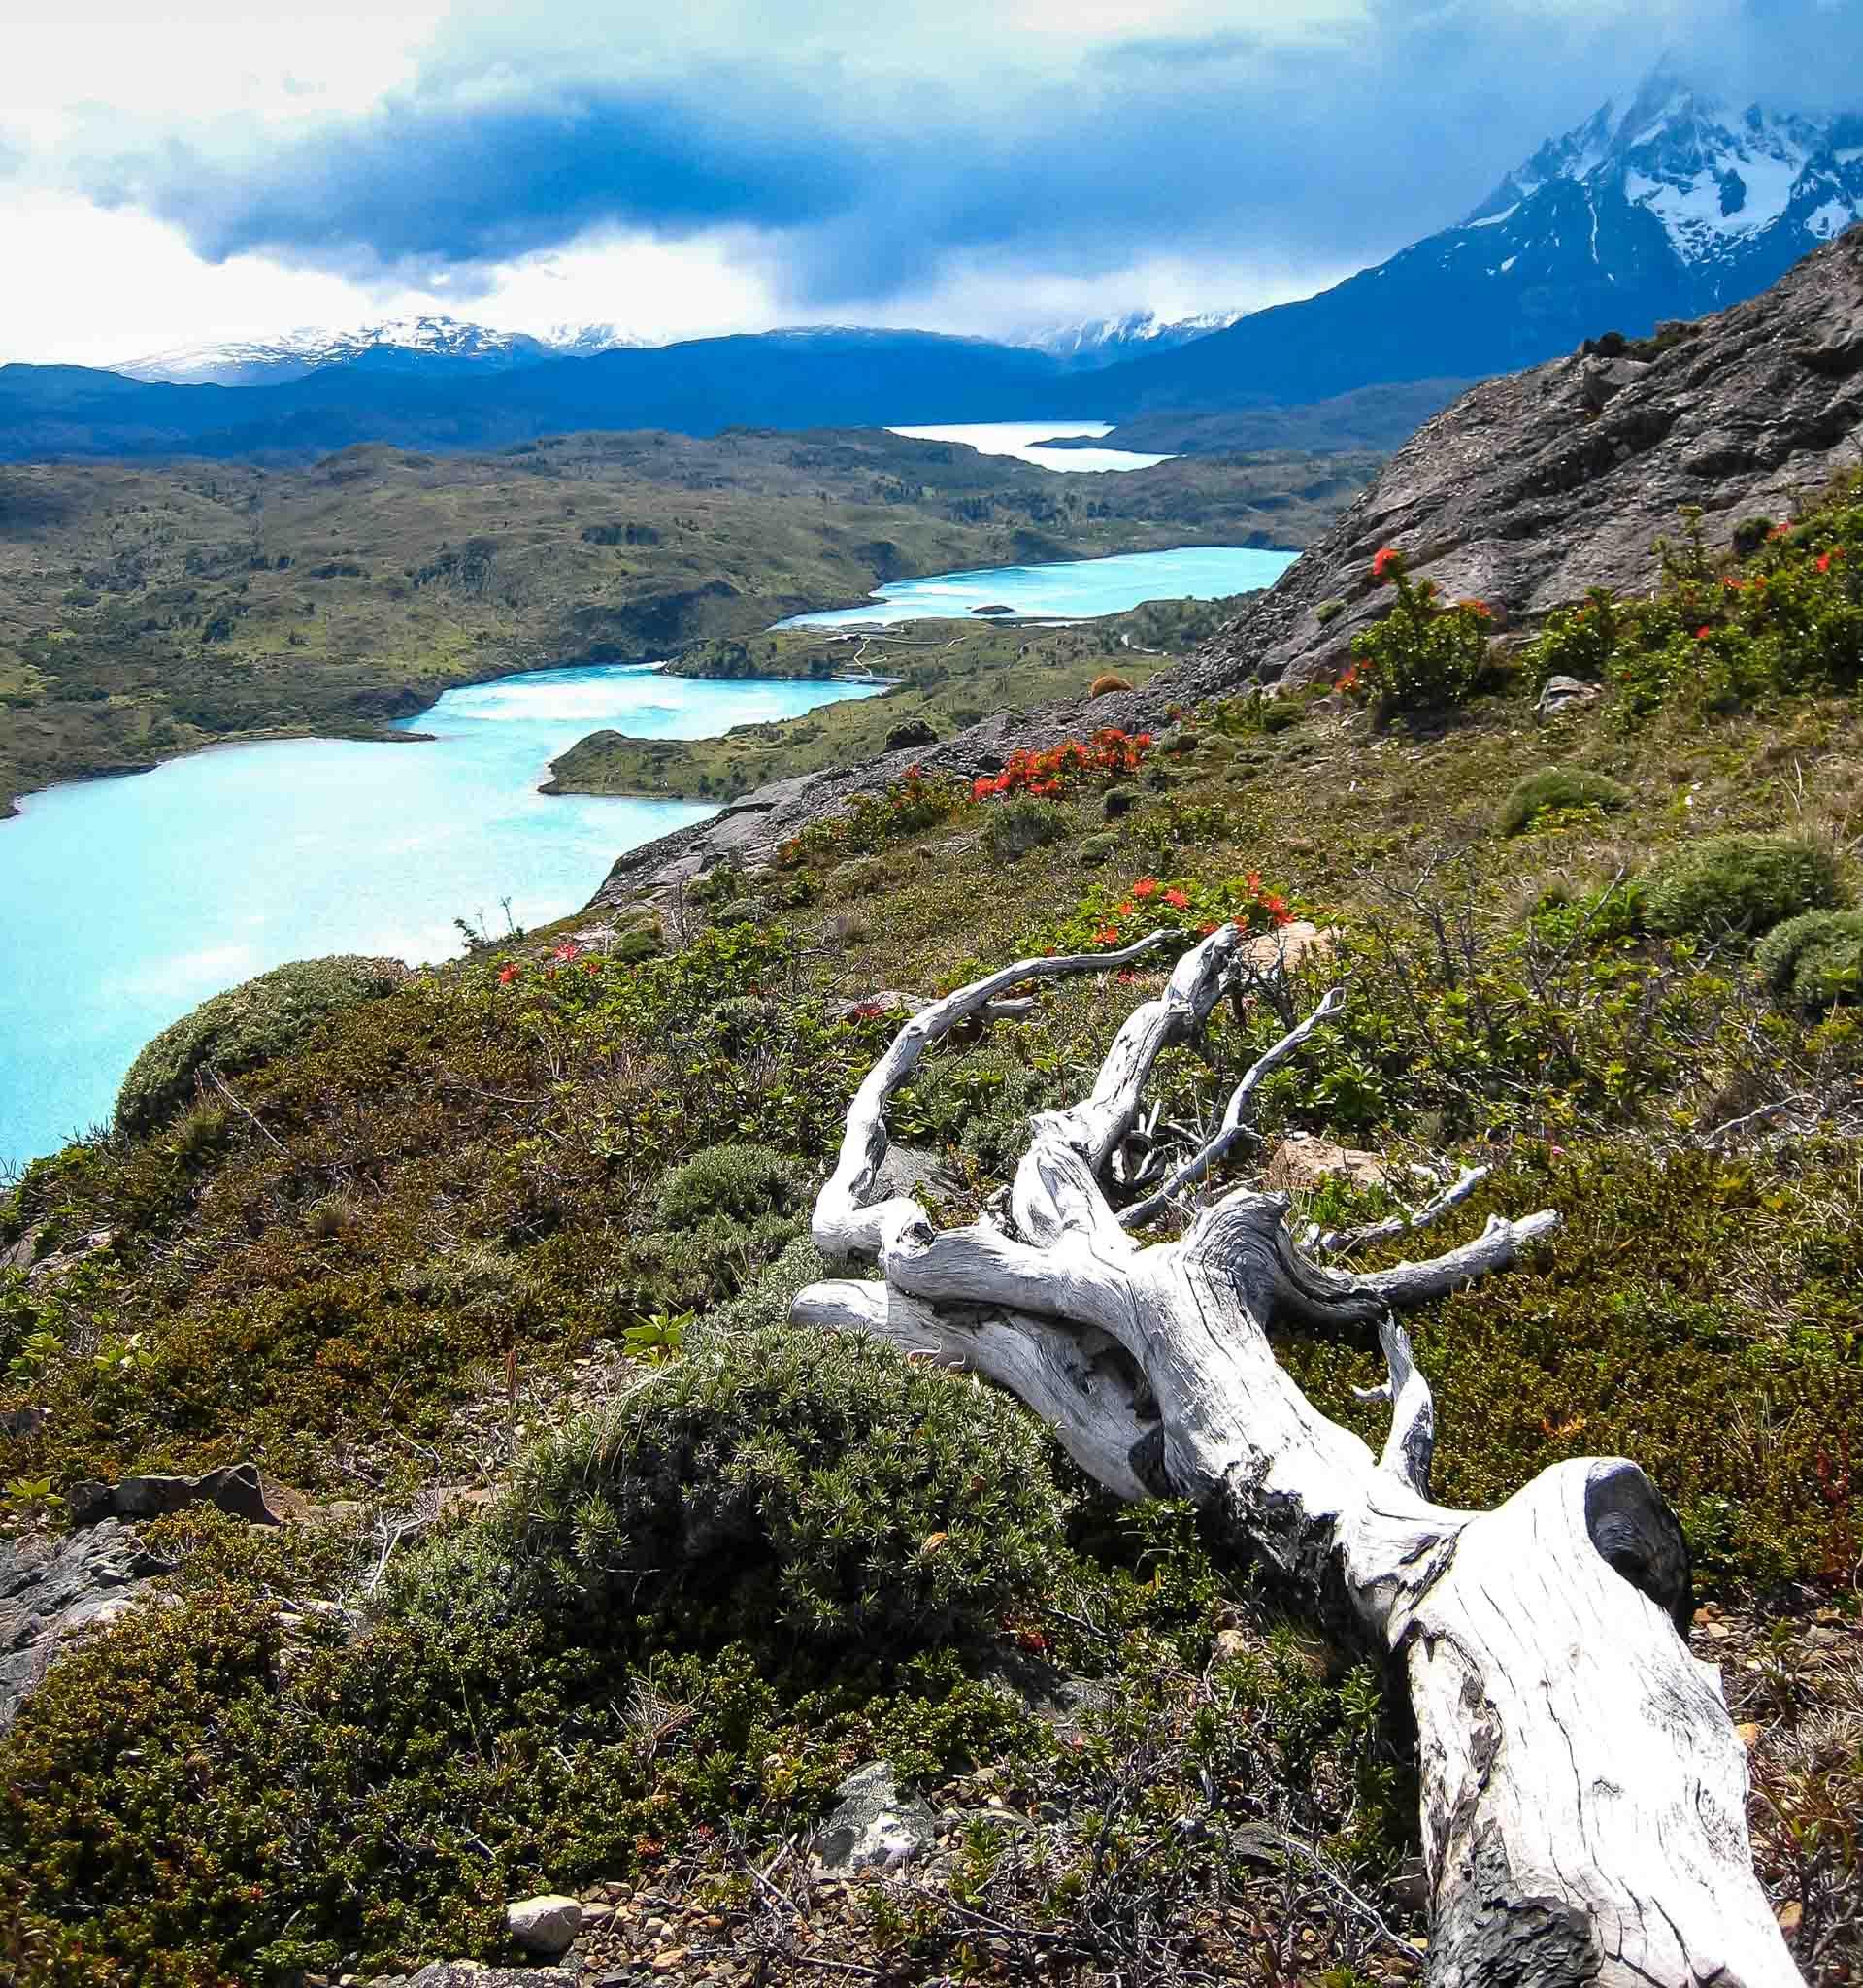 Hike Patagonia Chile